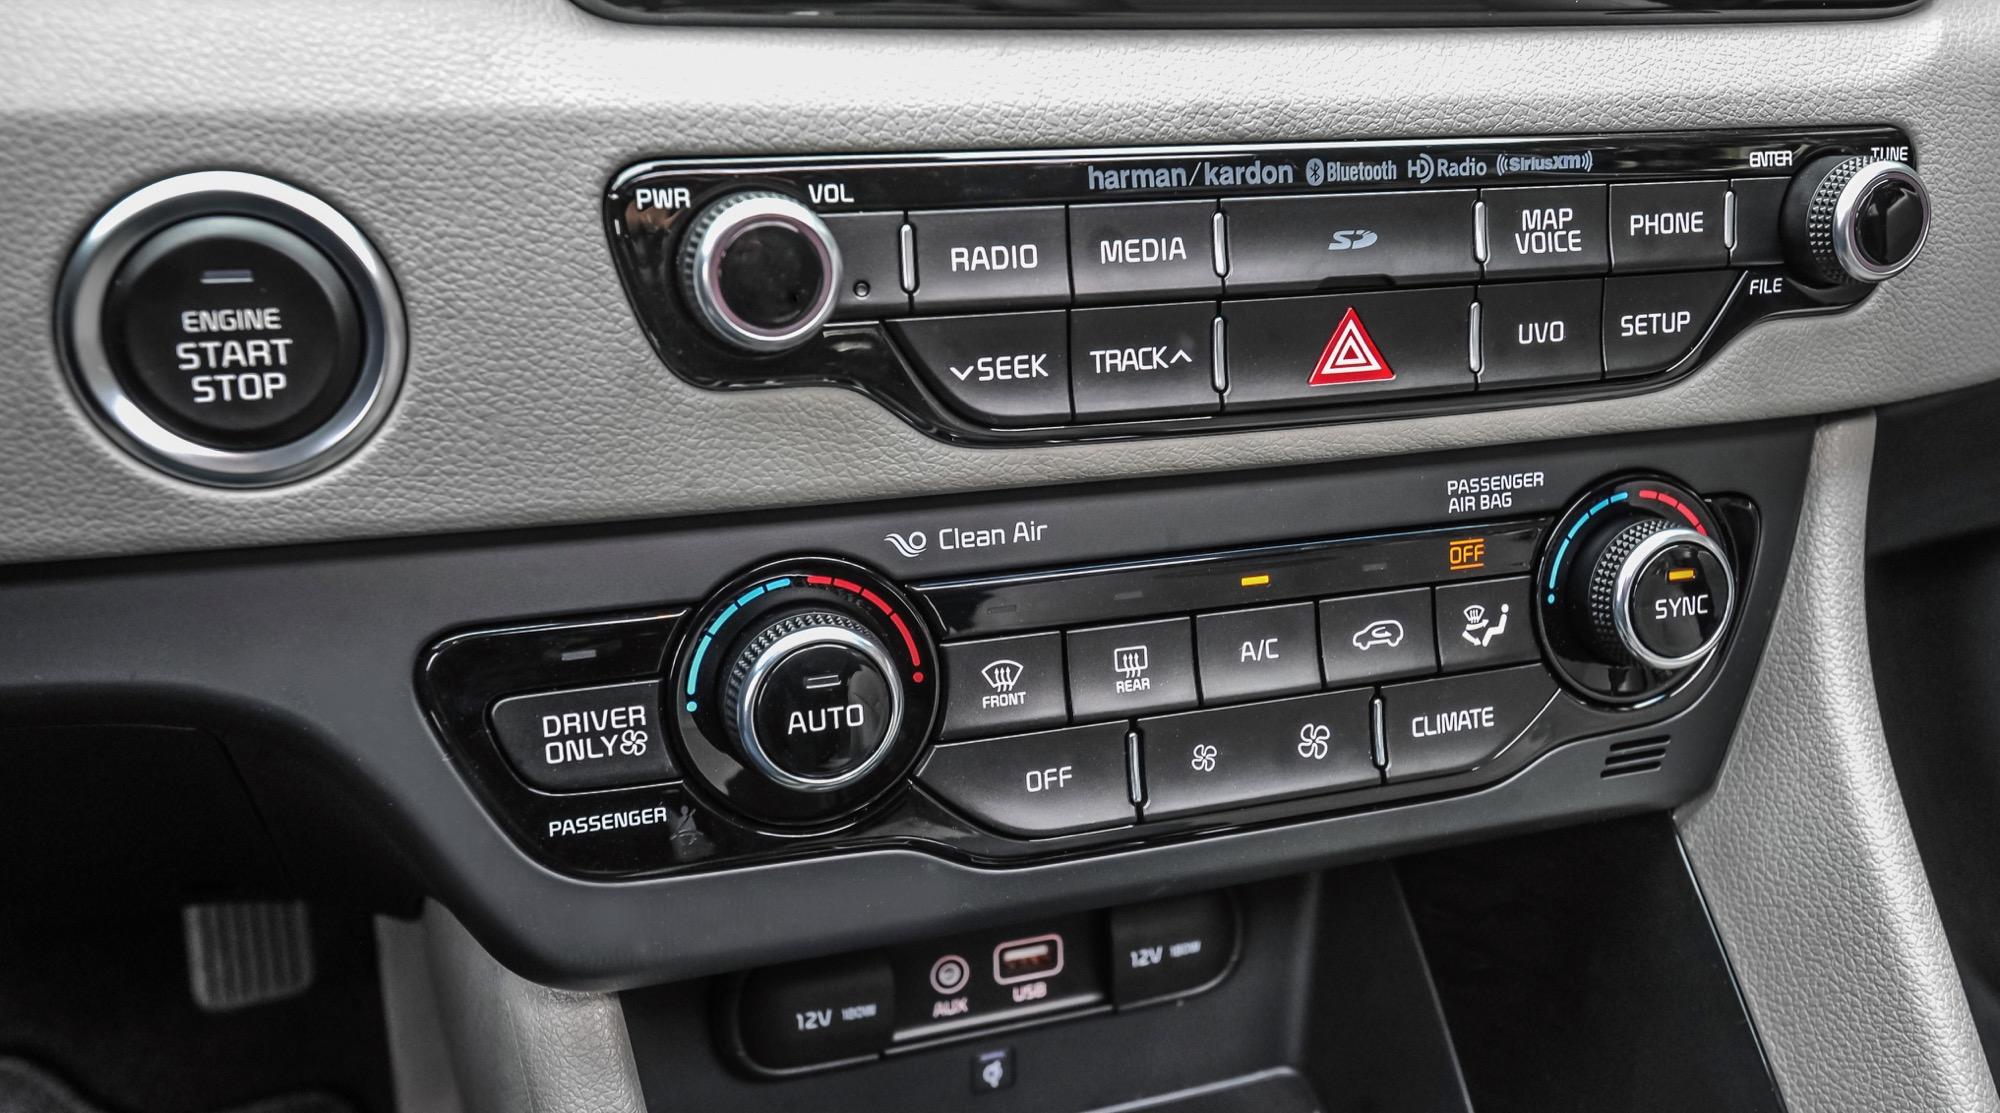 2017 Kia Niro Hybrid Review